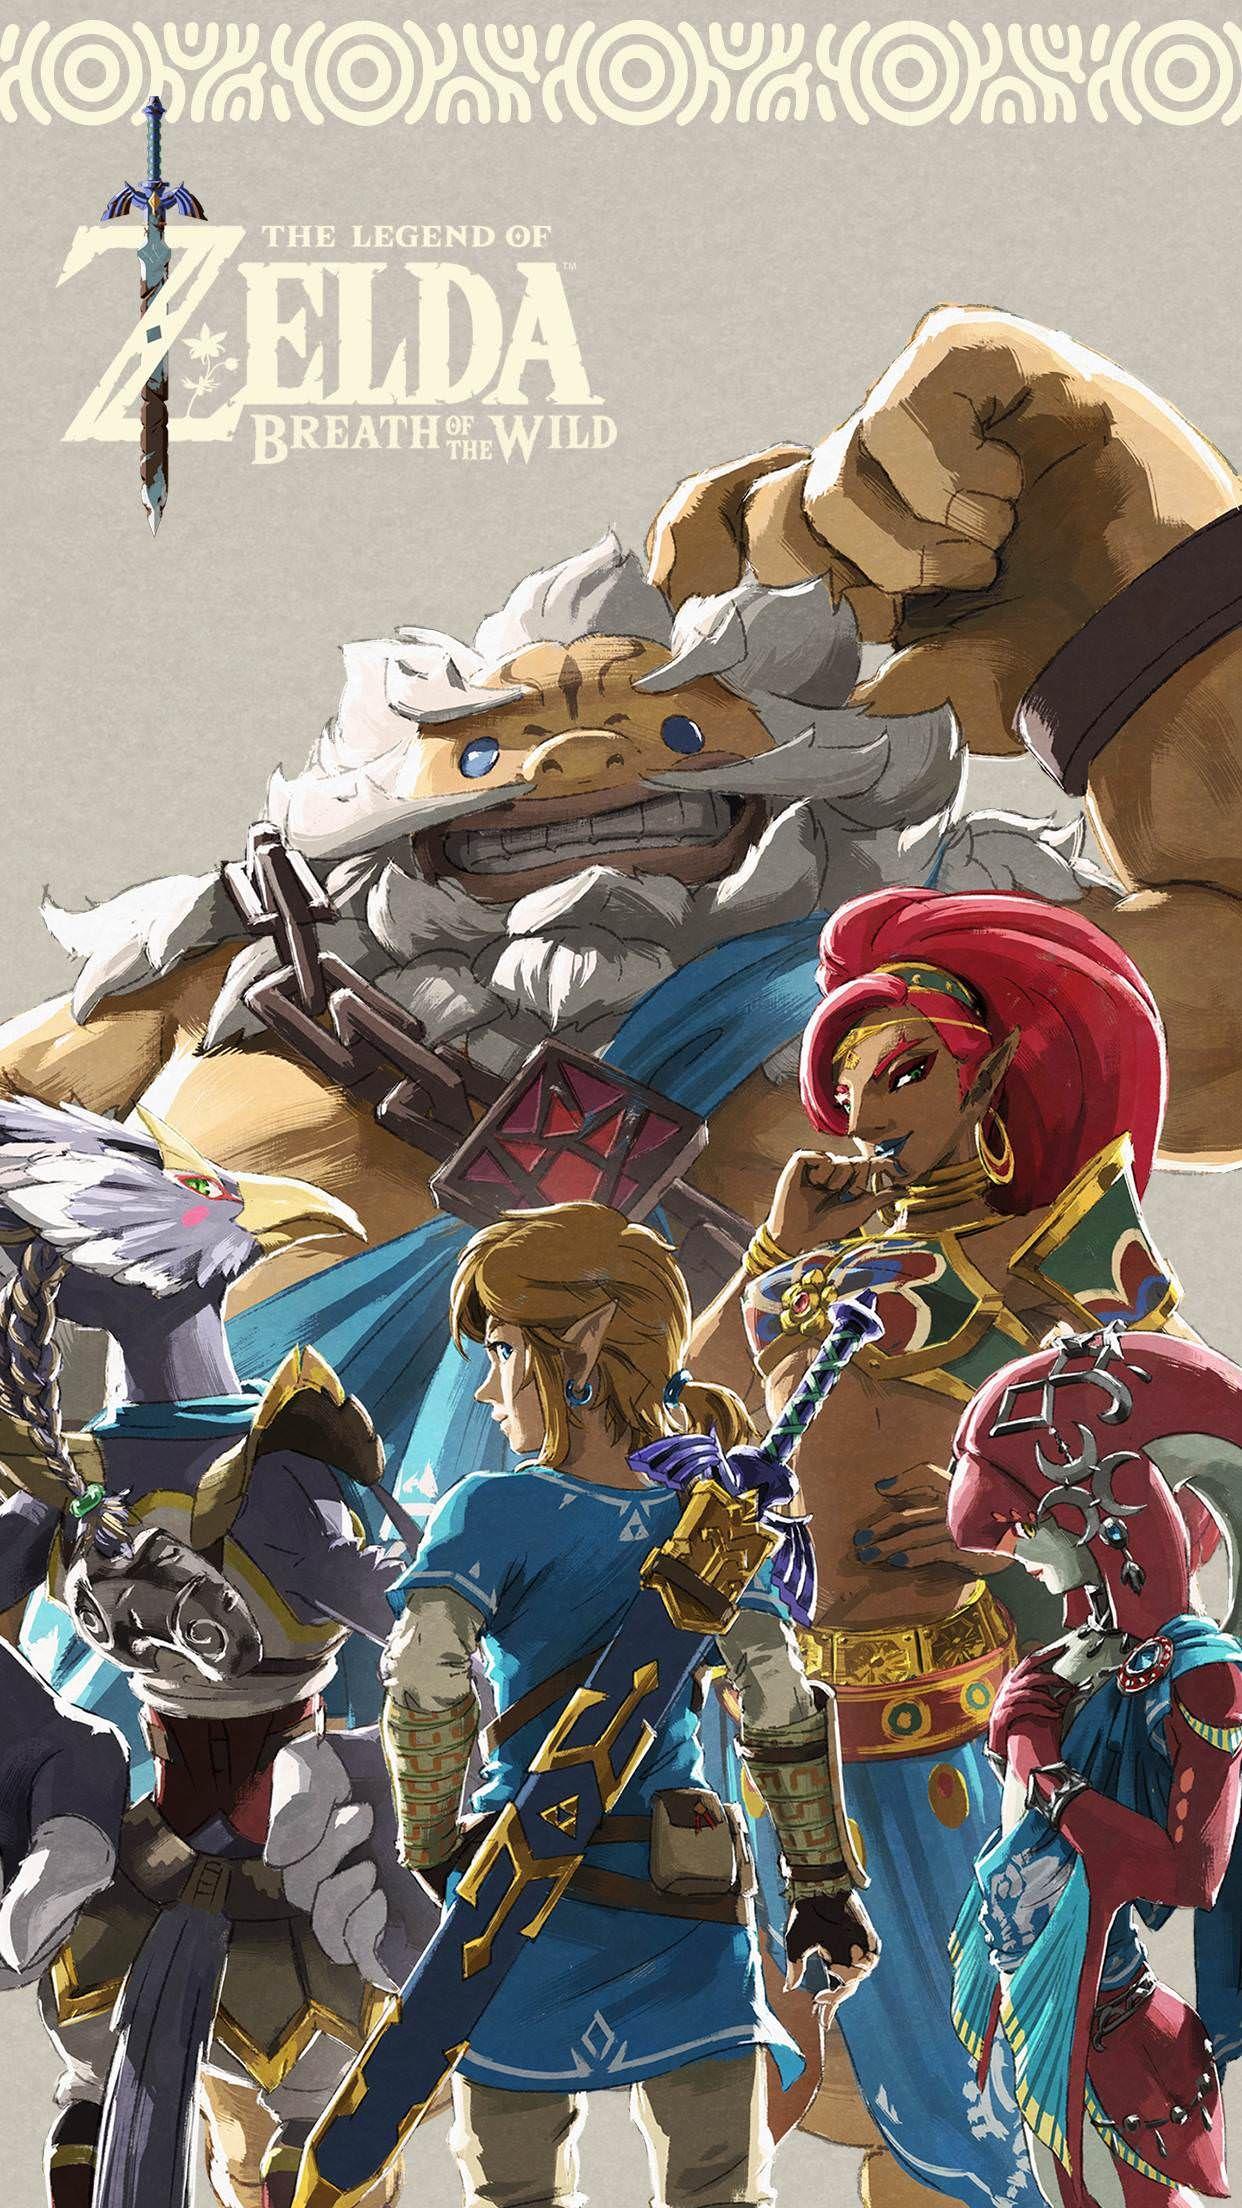 Legend Of Zelda Breath Of The Wild Champions , HD Wallpaper & Backgrounds